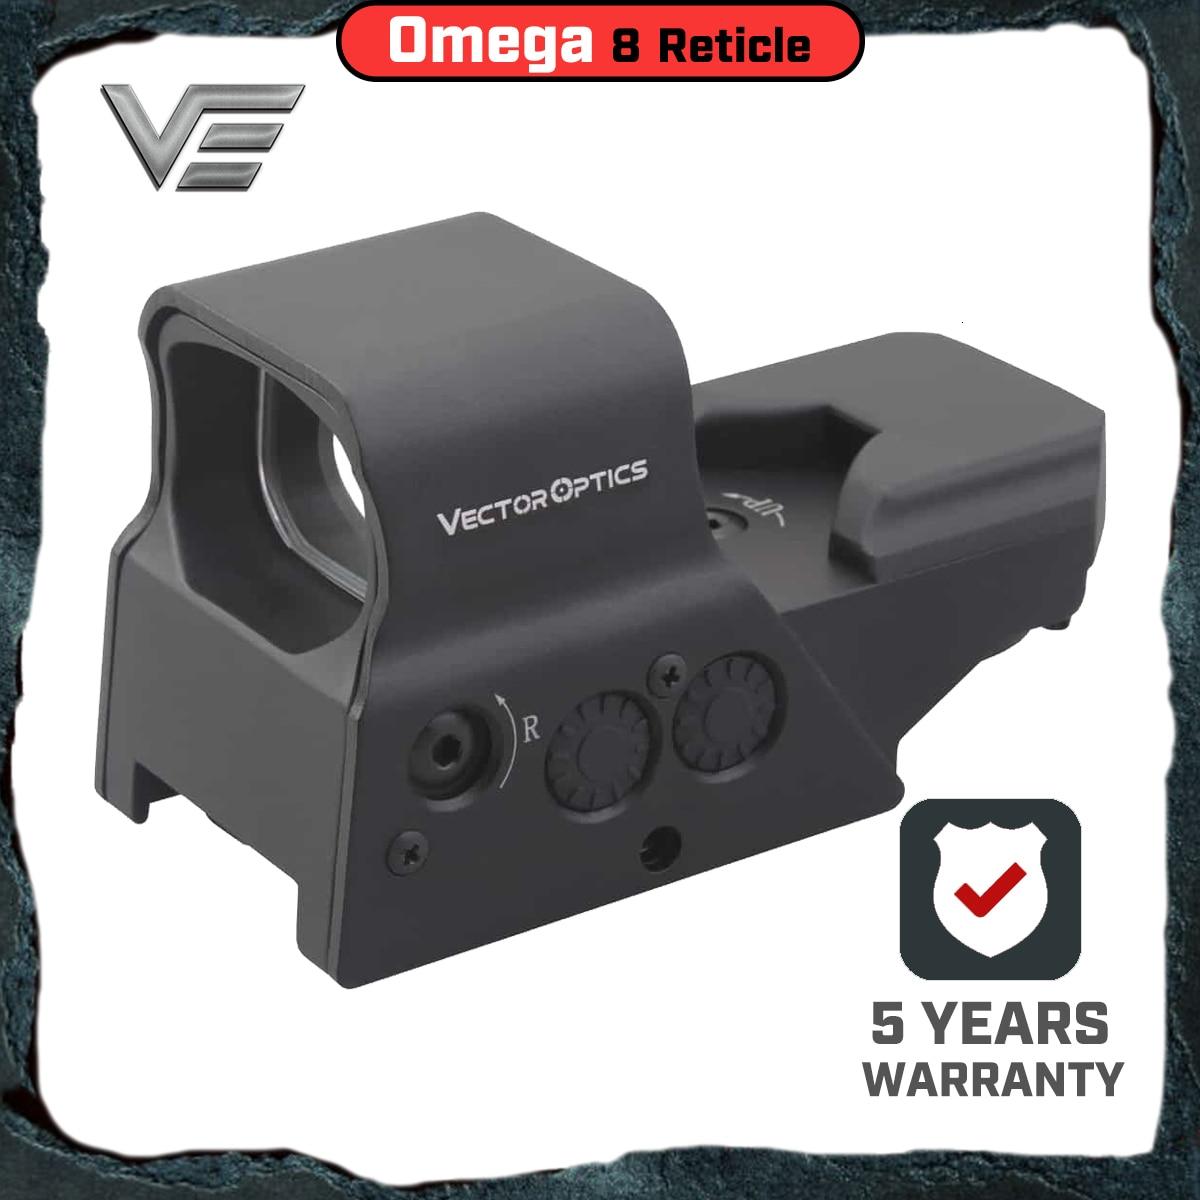 retículo red dot sight high end qualidade